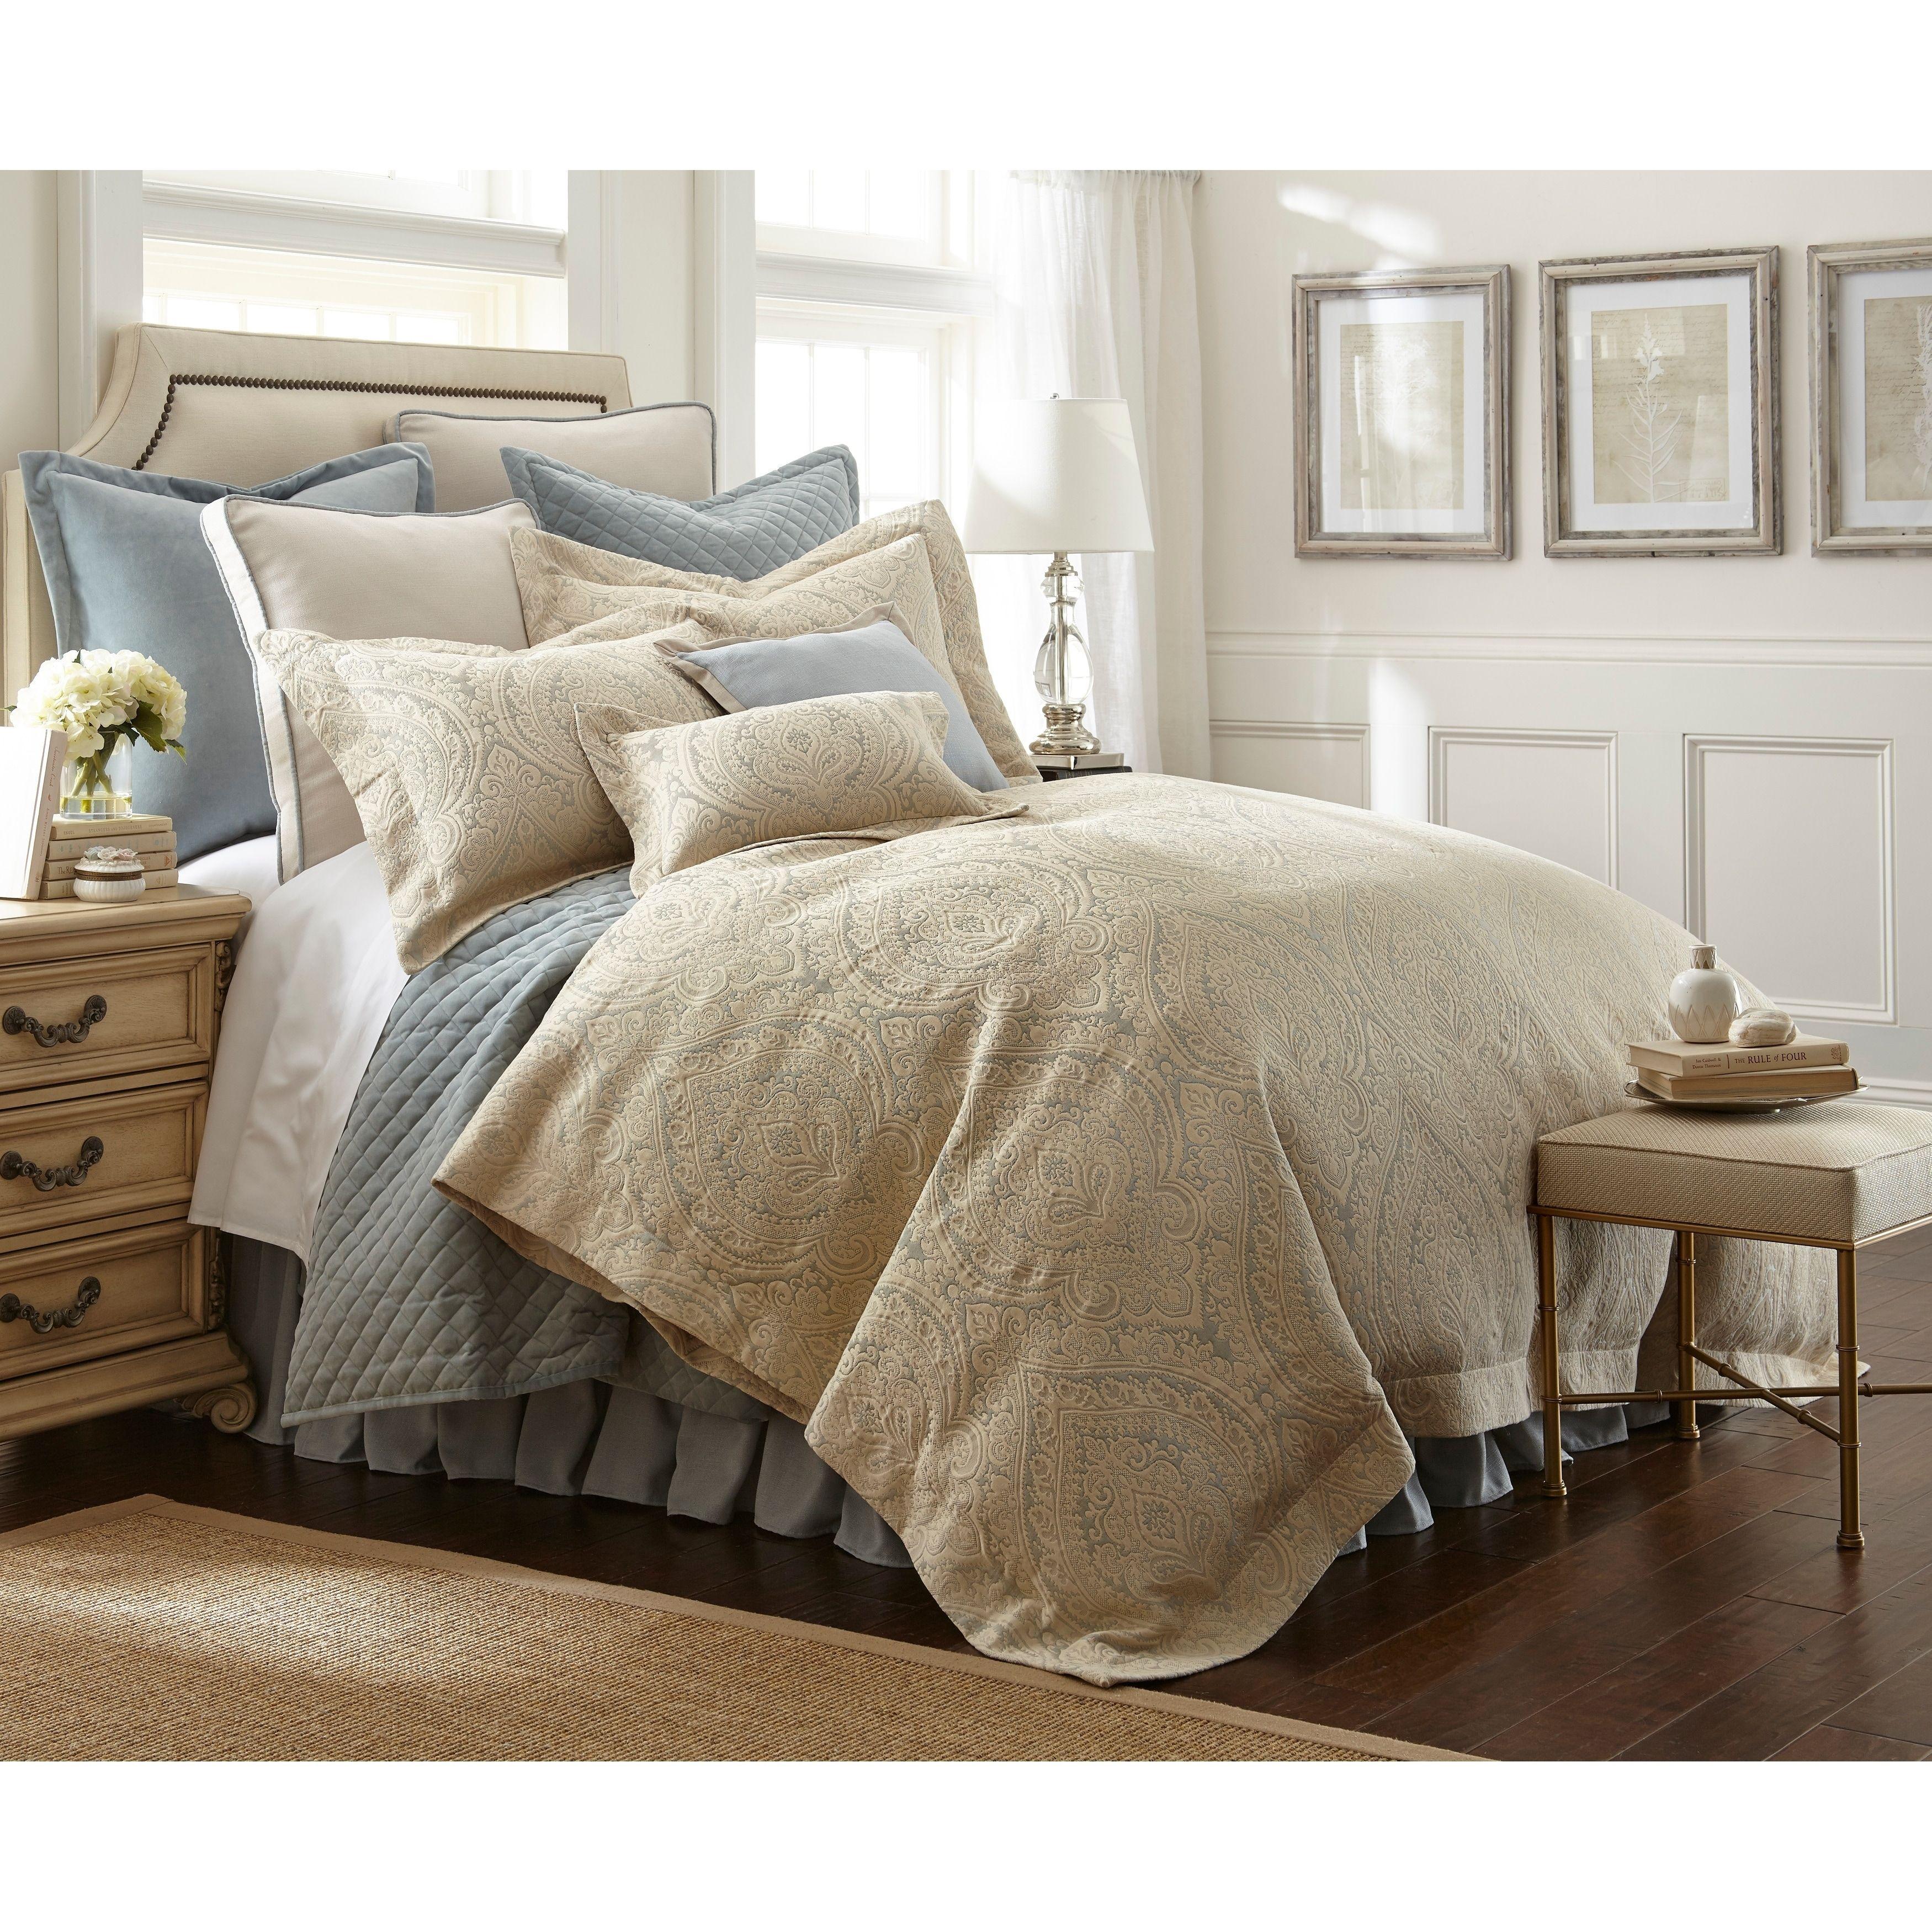 Pchf Abigail 3 Piece Luxury Duvet Set Queen Blue Luxury Comforter Sets Luxury Duvet Sets Luxury Bedding